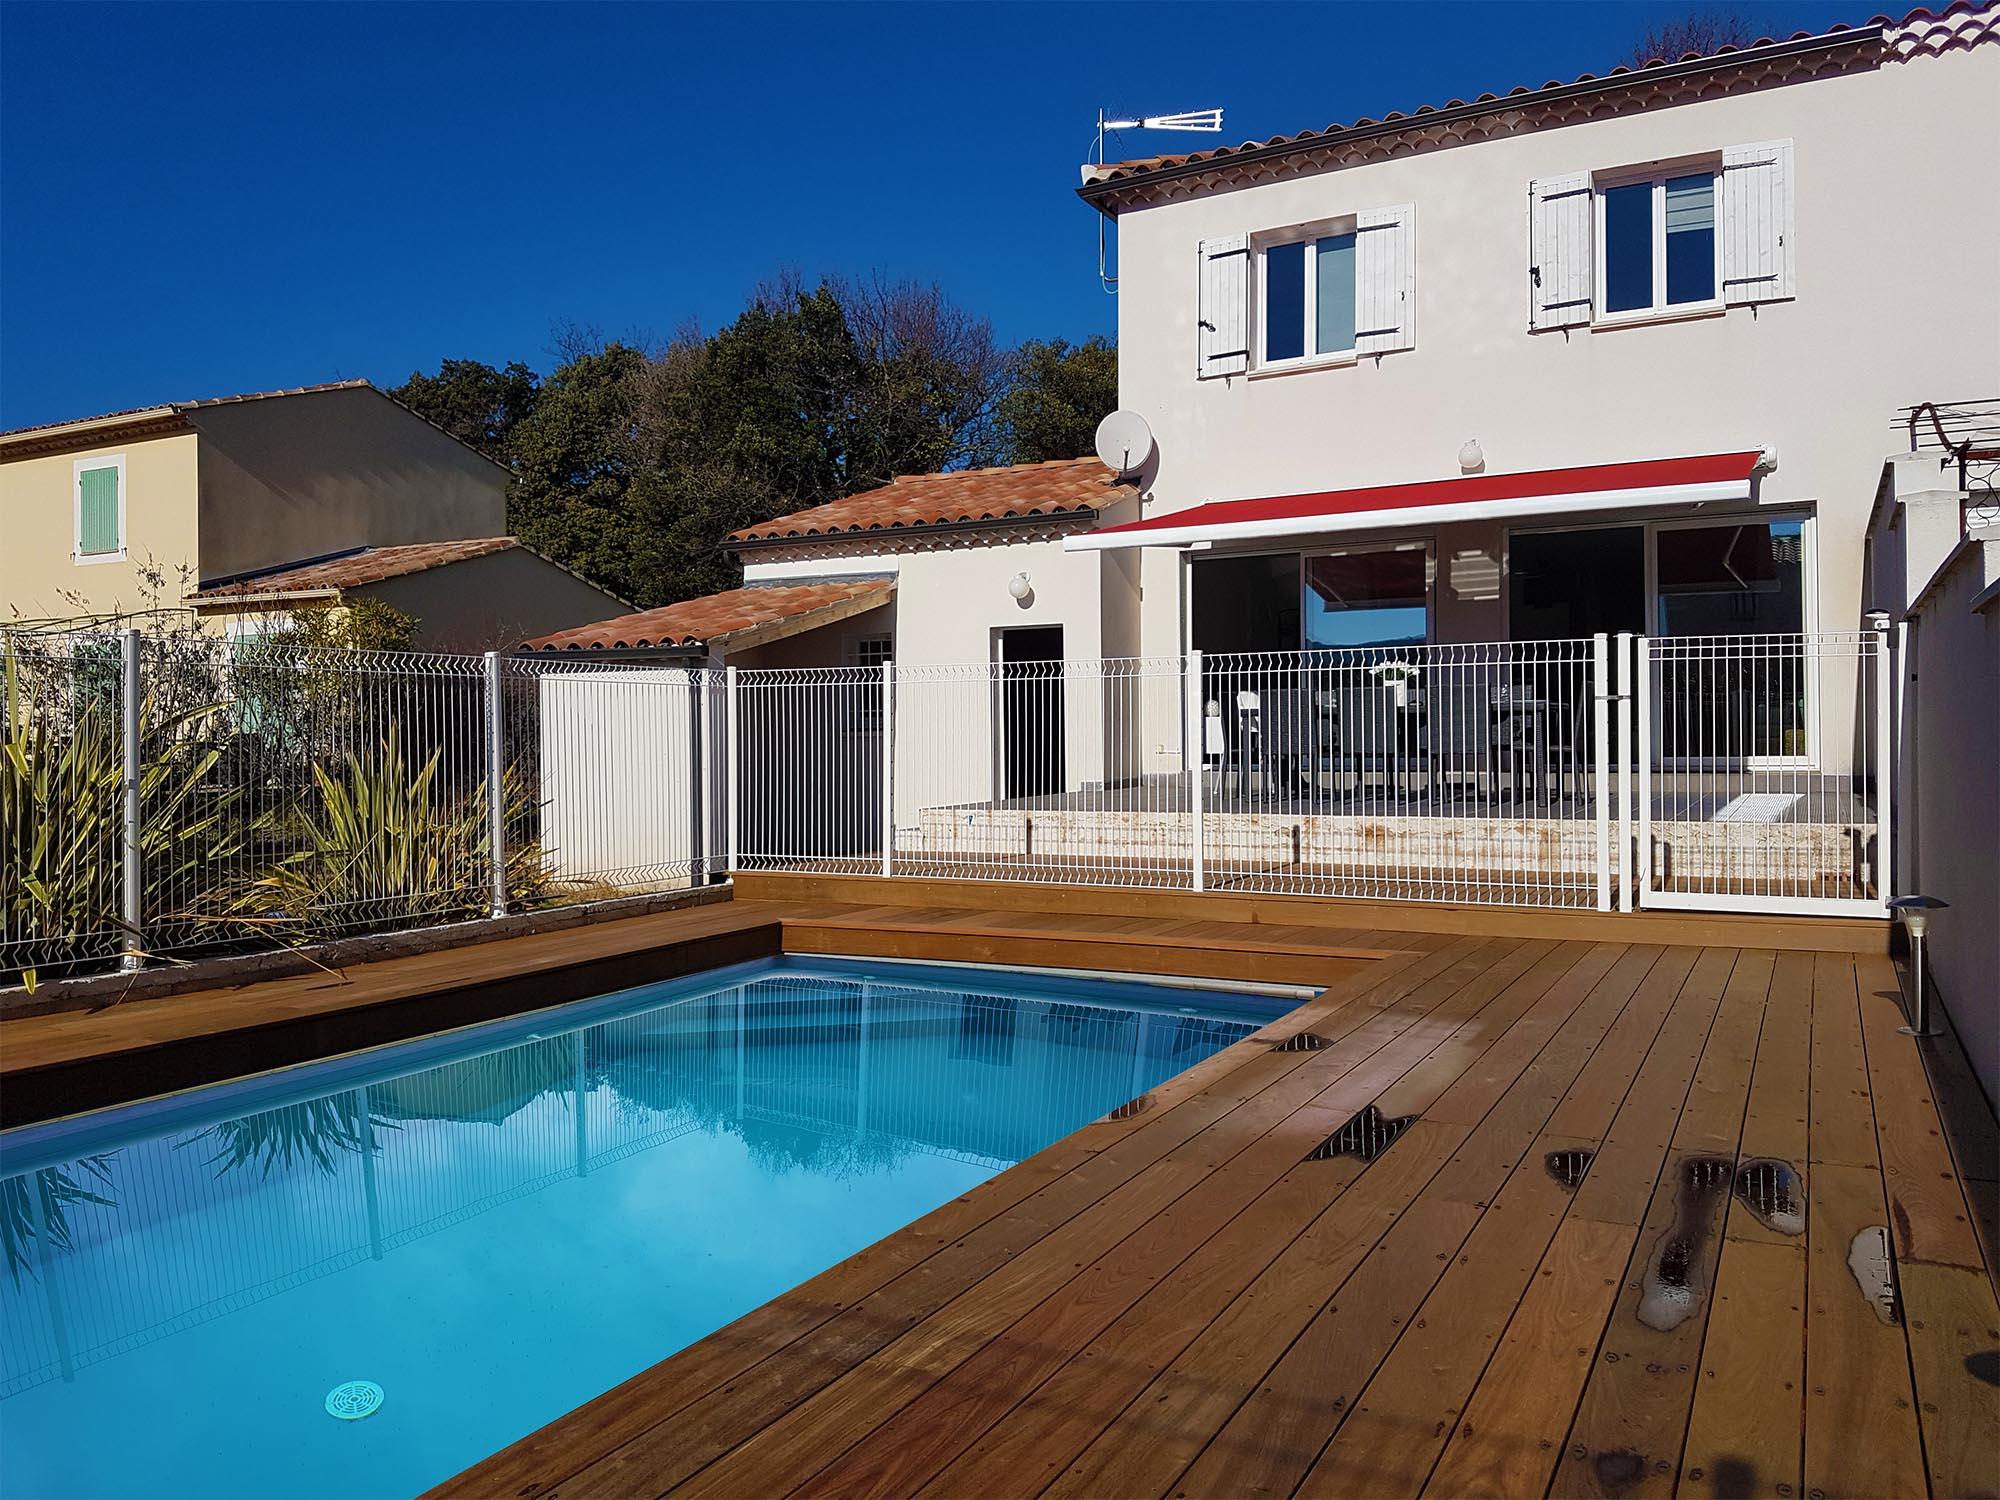 Apd30lir villa 3 chambres avec piscine chauff e alpes for Photo maison avec piscine